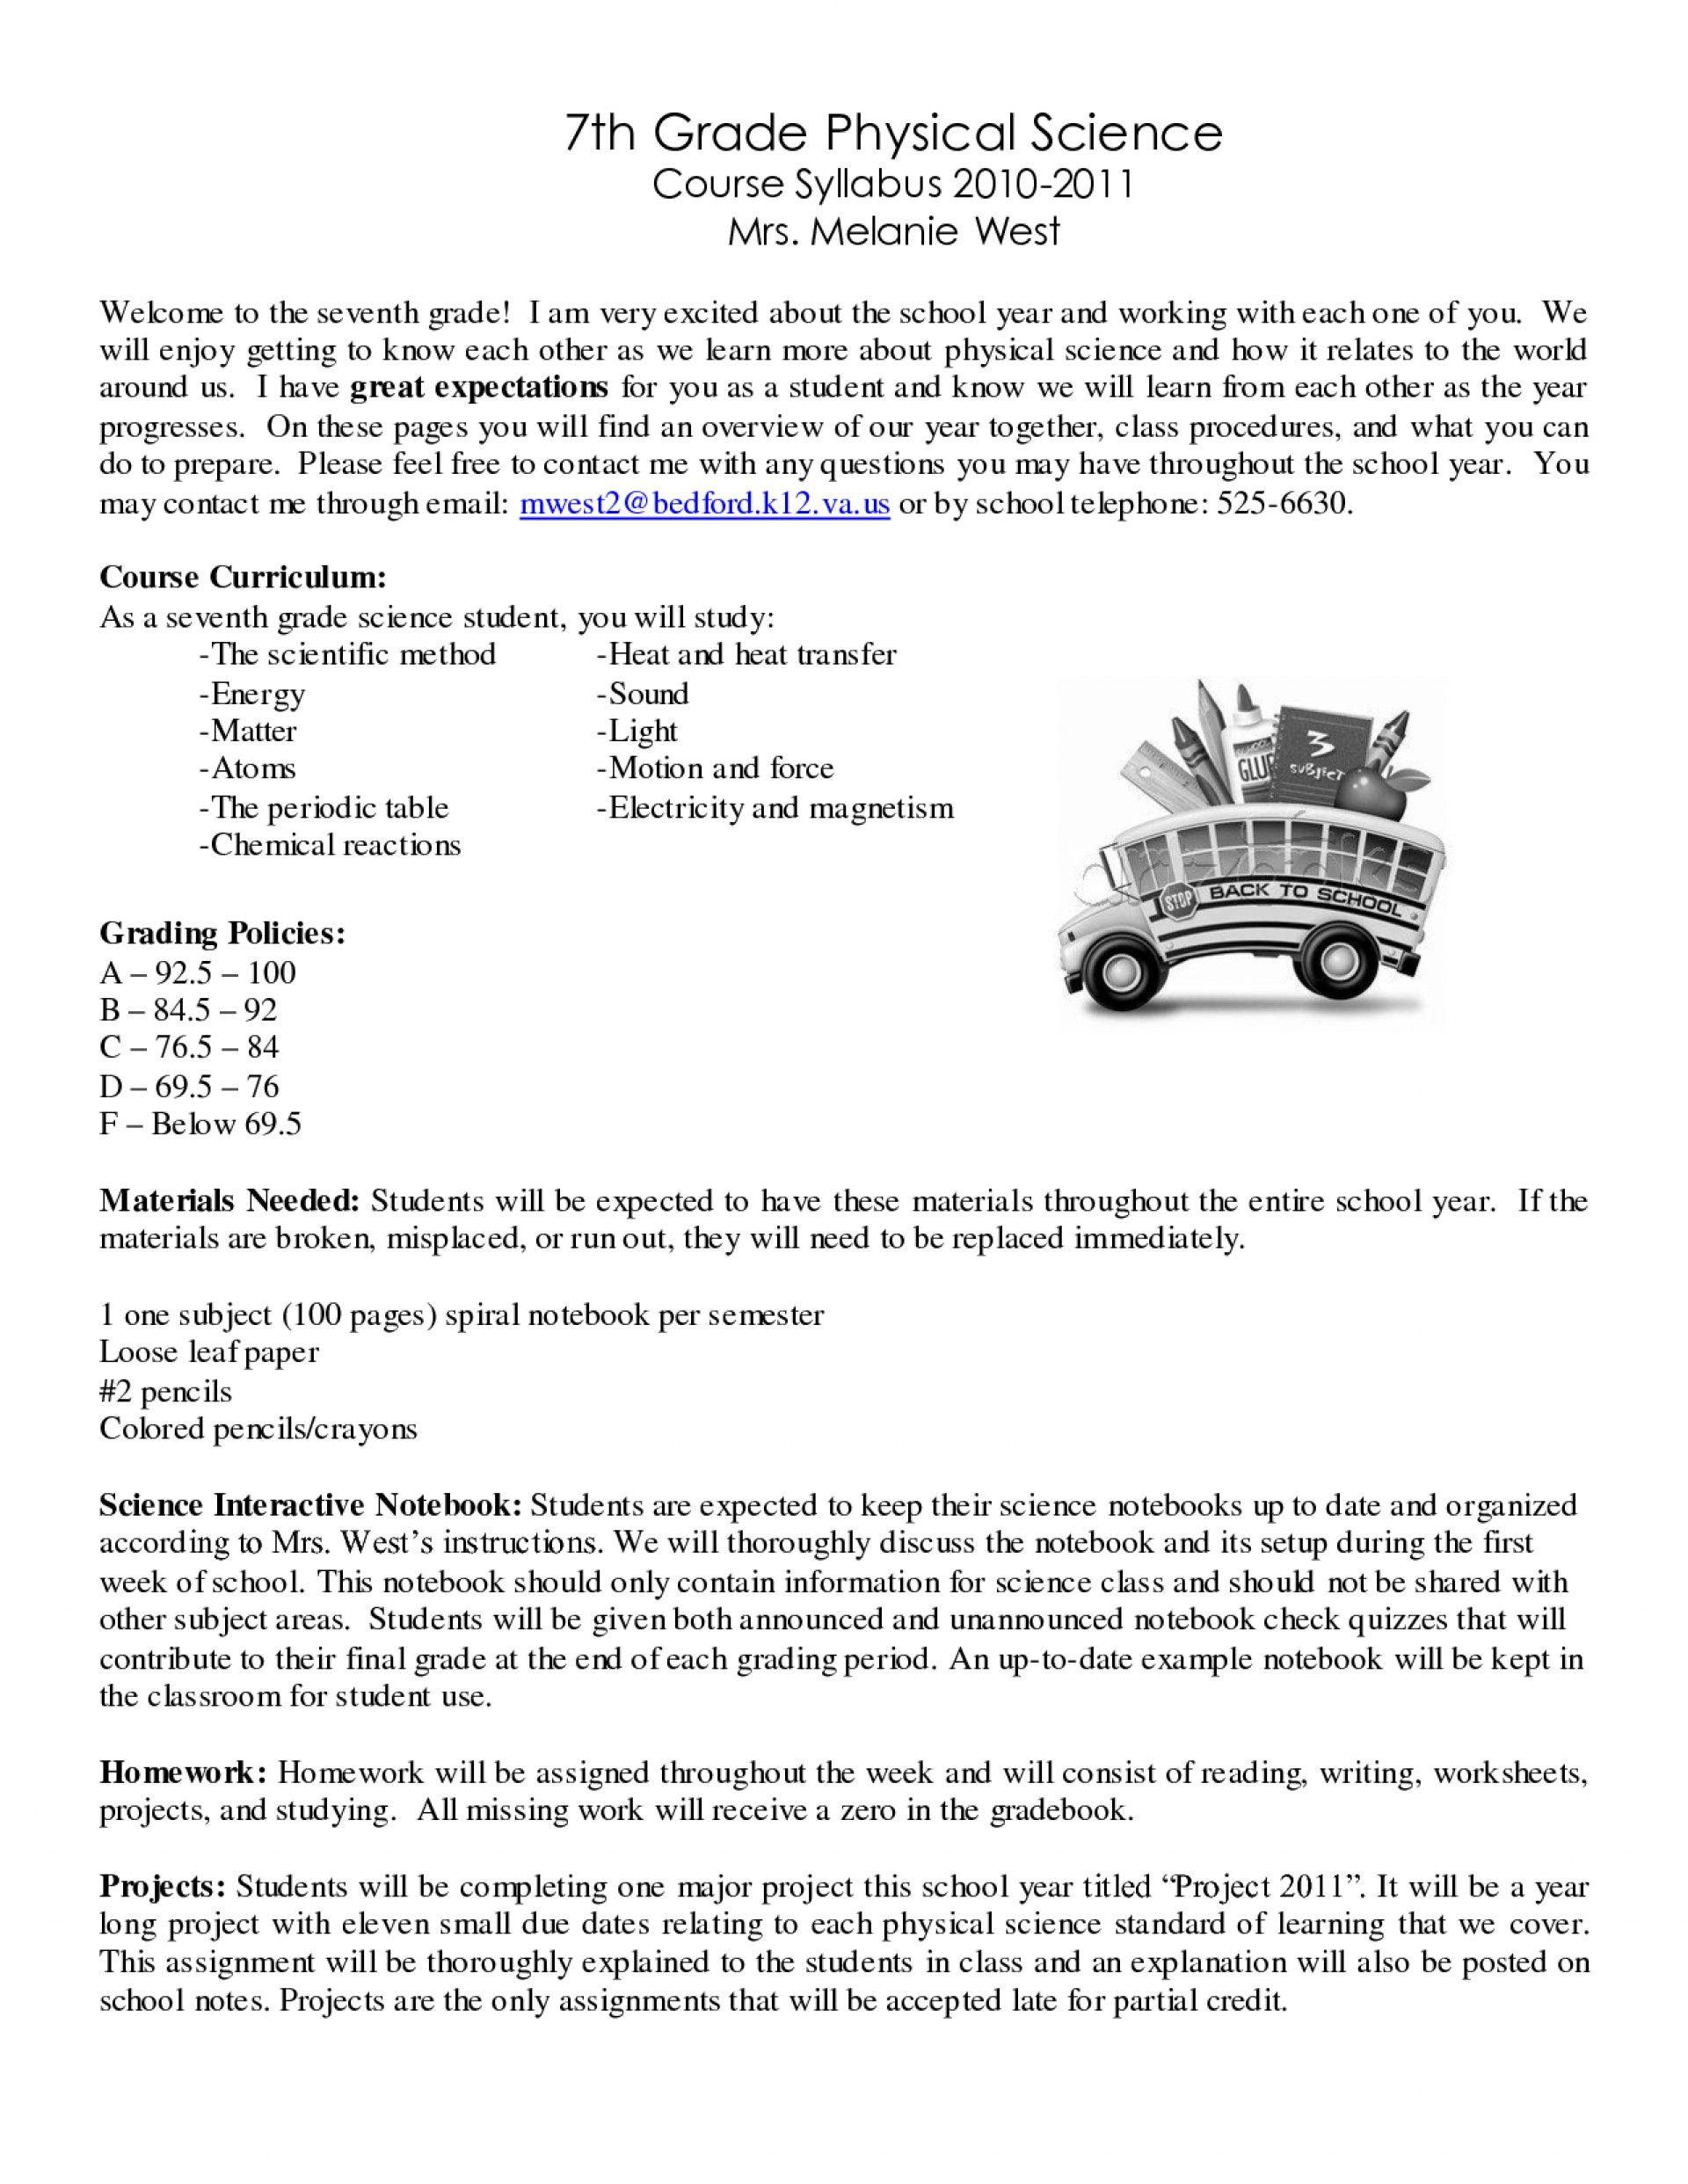 7th Grade Language Arts Worksheets In 2020 Language Arts Worksheets Chemistry Worksheets Science Worksheets